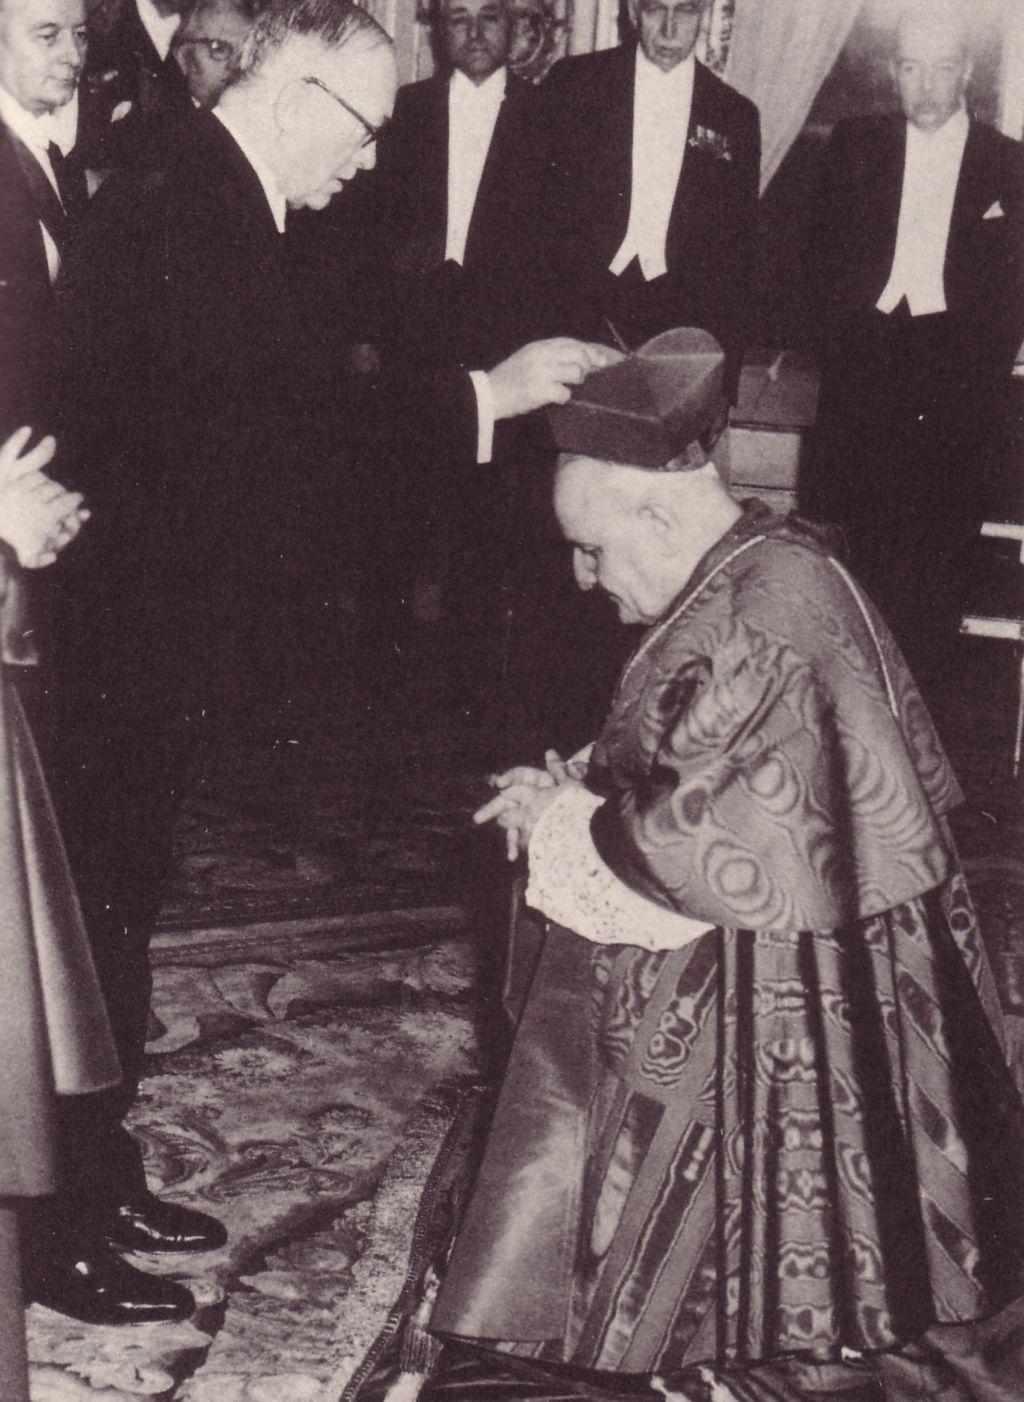 Anti-Pope John XXIII with Vincent Auriol